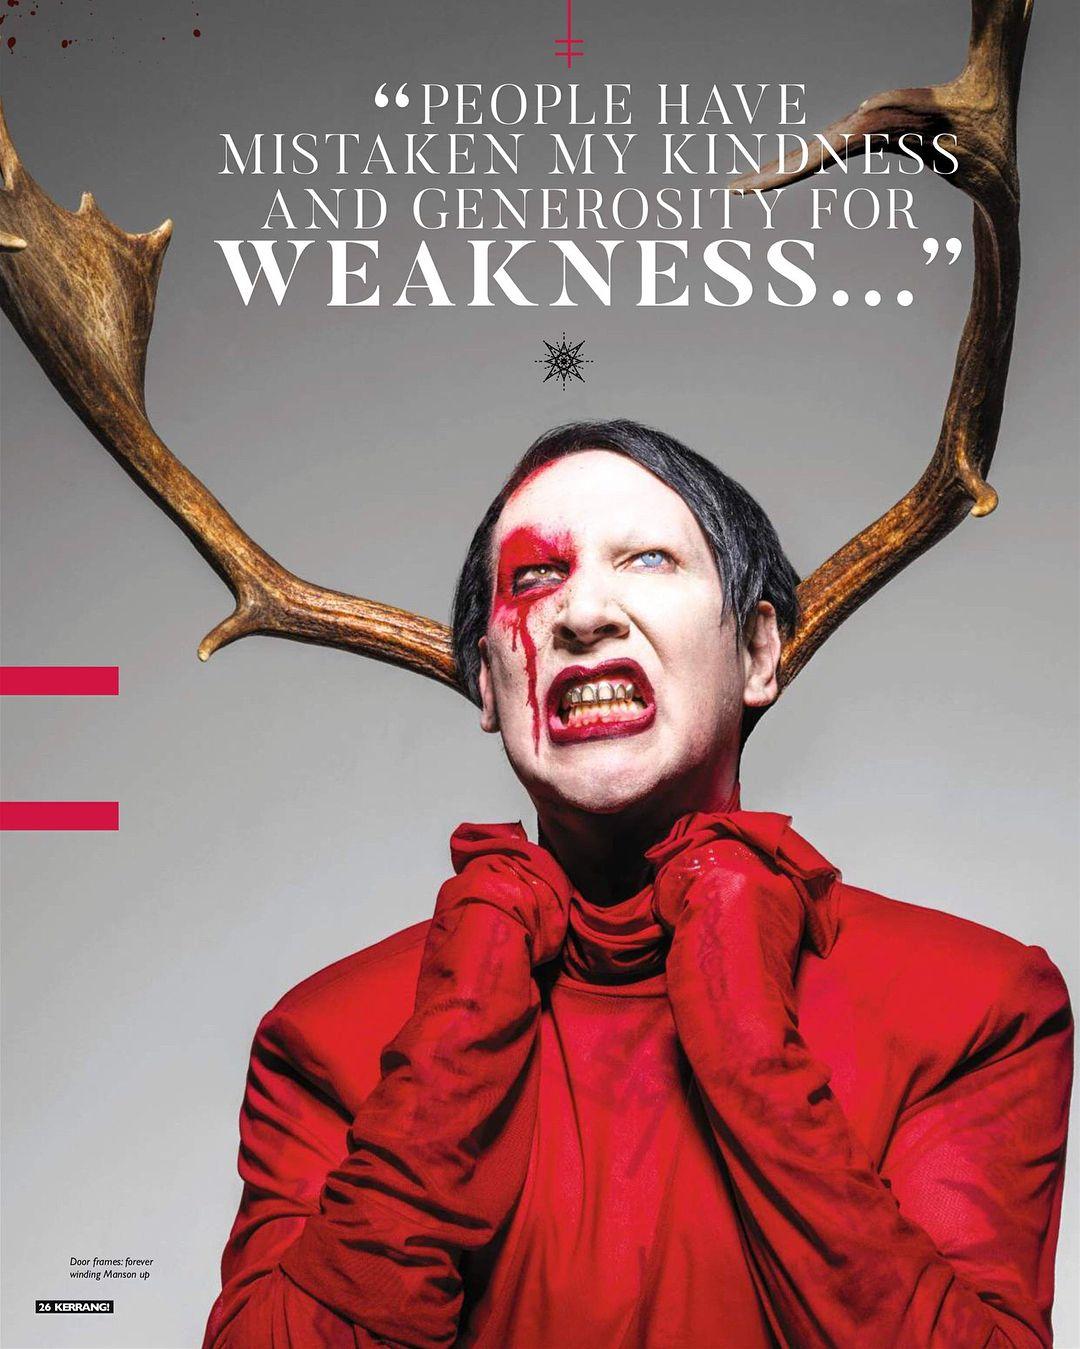 Pin On Marilyn Manson